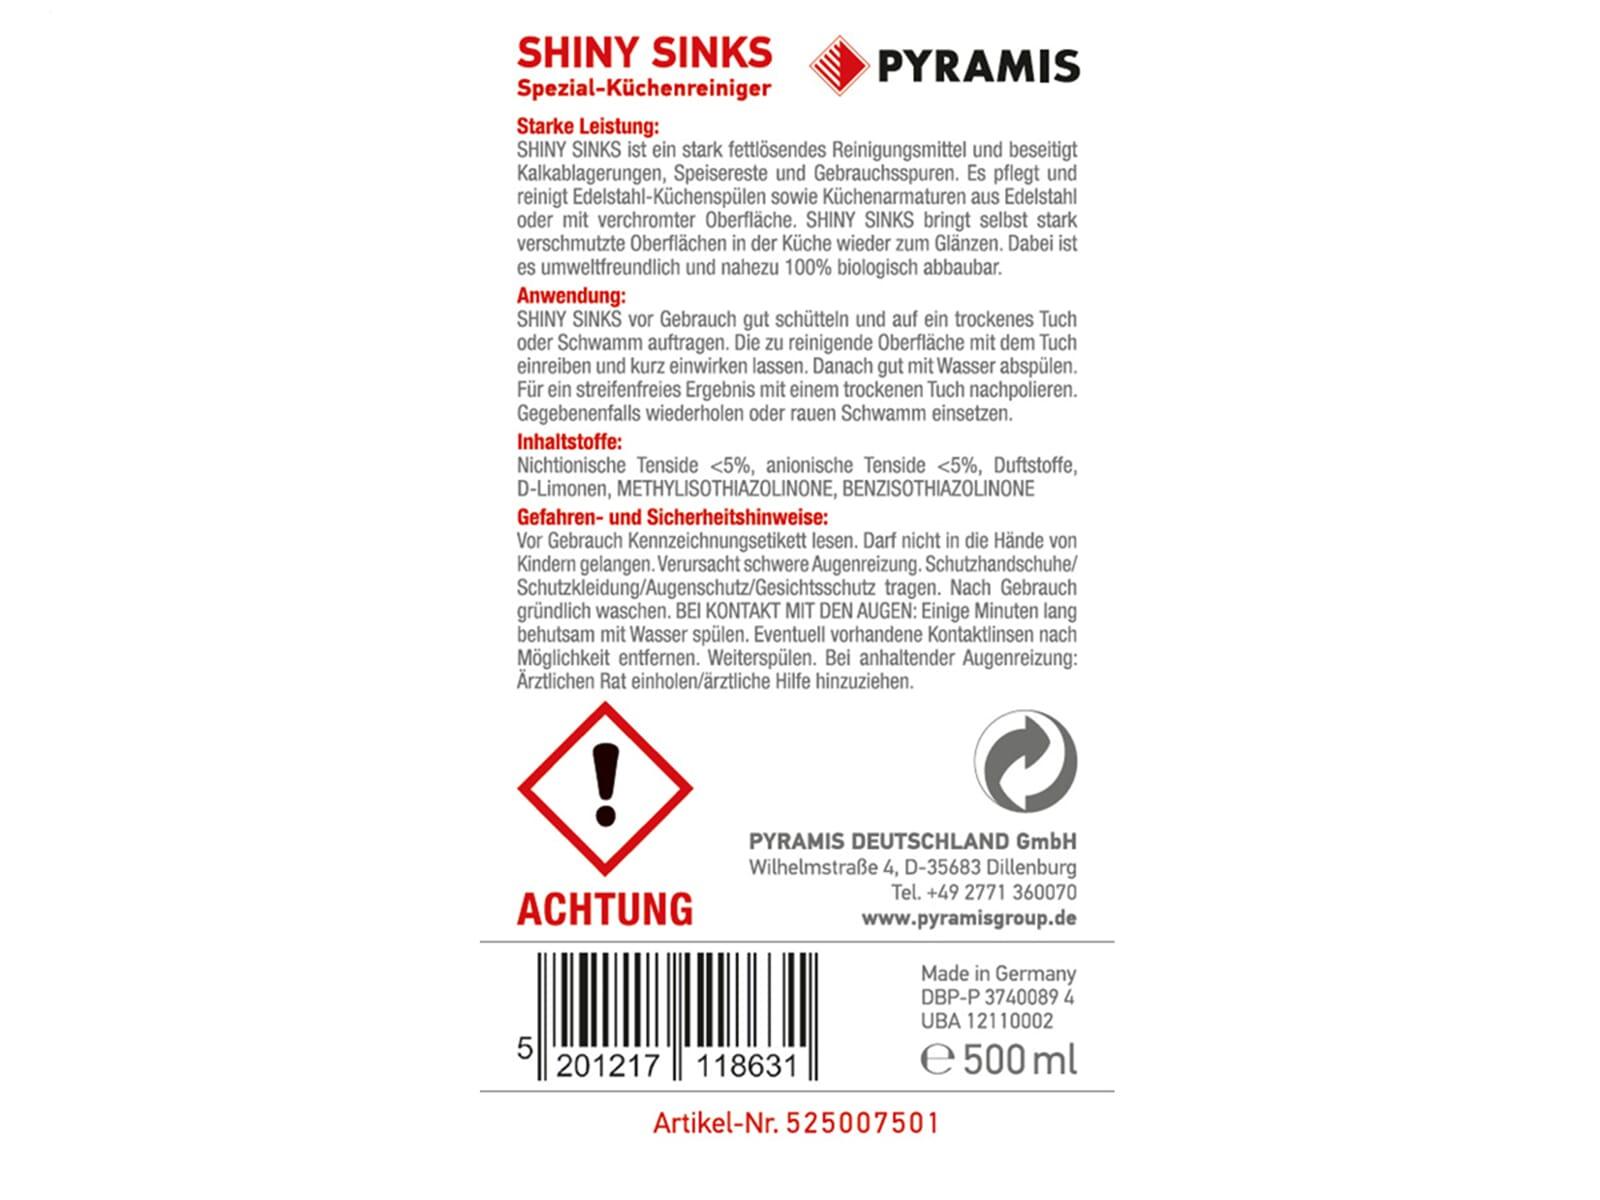 Pyramis 525007501 Shiny-Sinks Reinigungsmittel